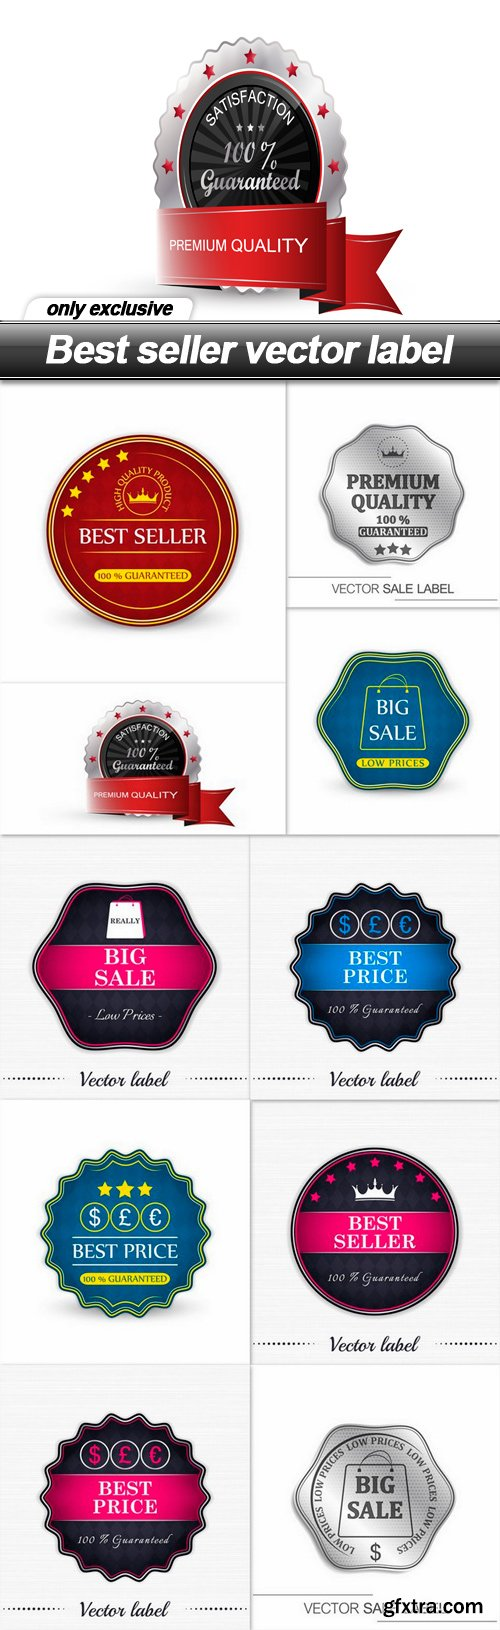 Best seller vector label - 10 EPS